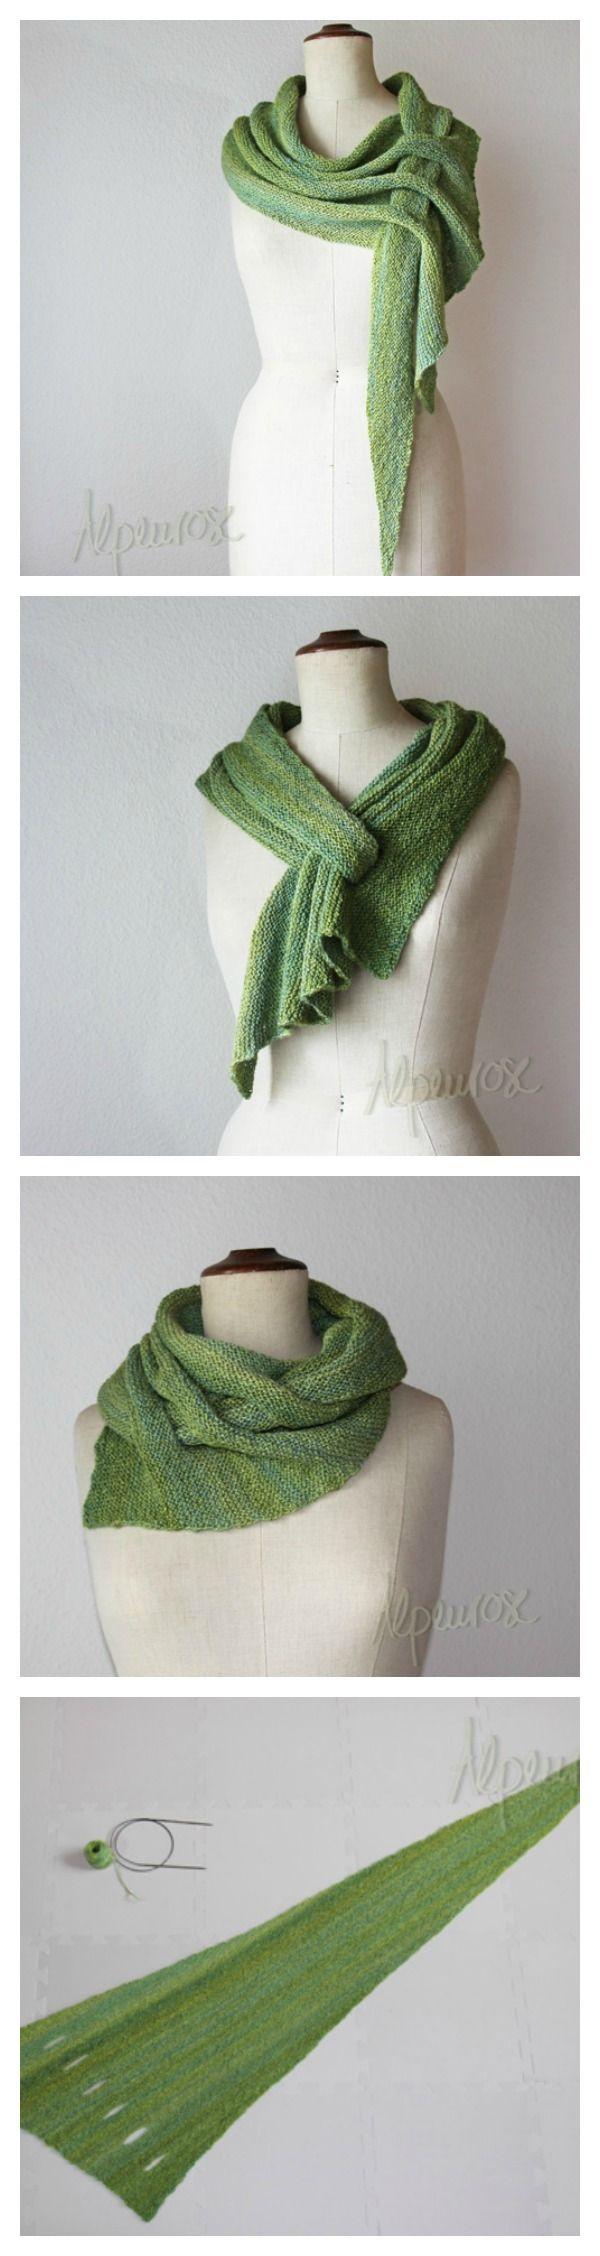 Arrow Caterpillar Scarf Free Knitting Pattern---10+ Keyhole Scarves and Shawl Knitting Patterns